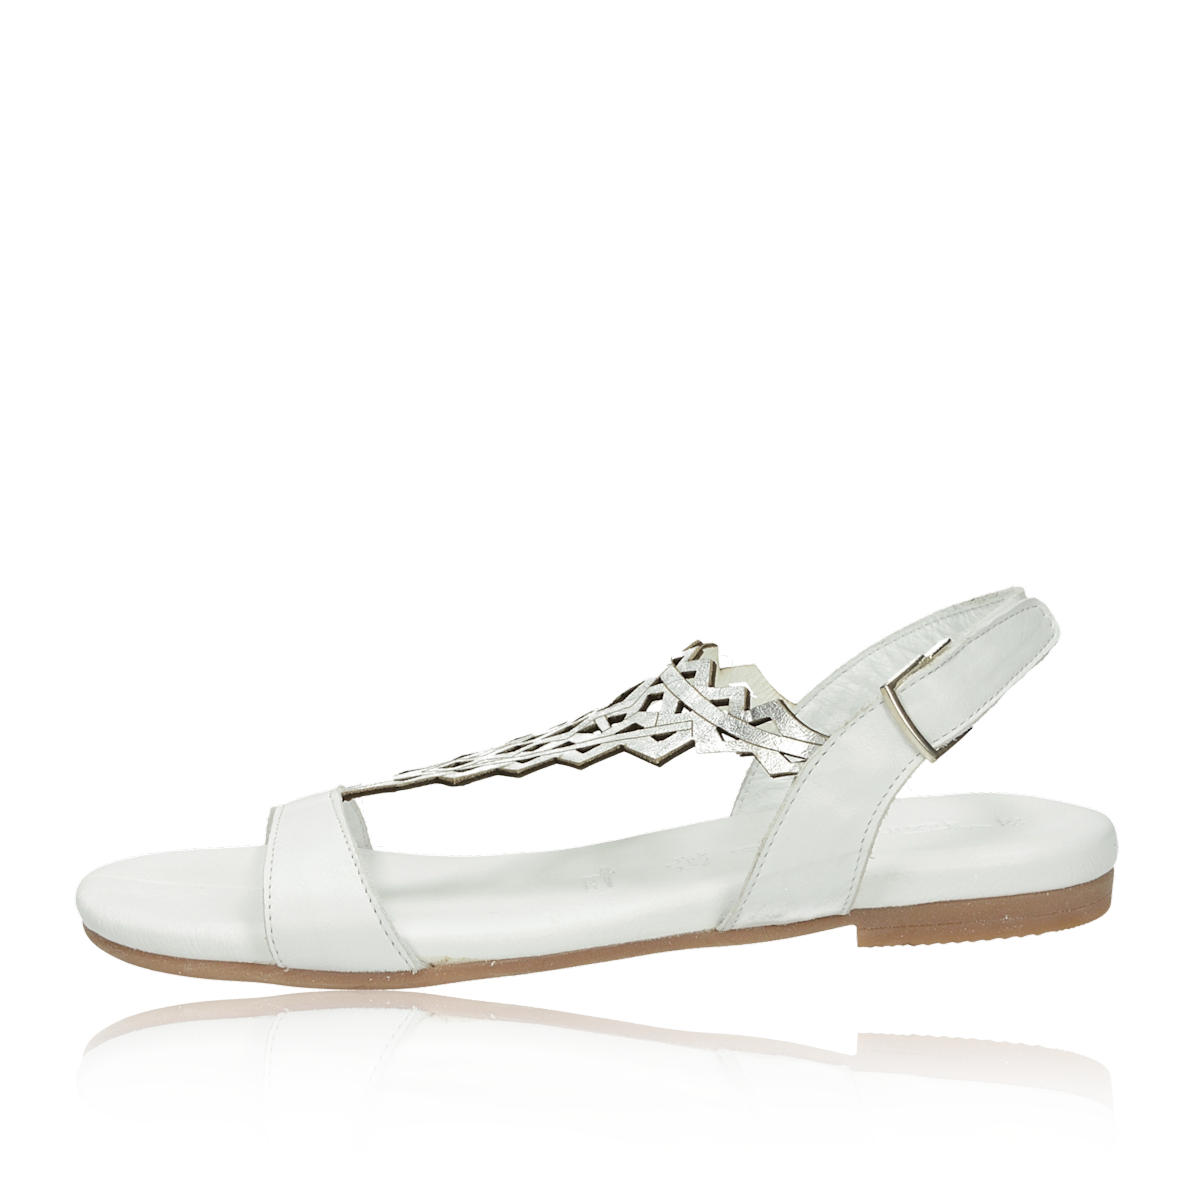 11bab16ab648 ... Tamaris dámske elegantné sandále na suchý zips - biele ...